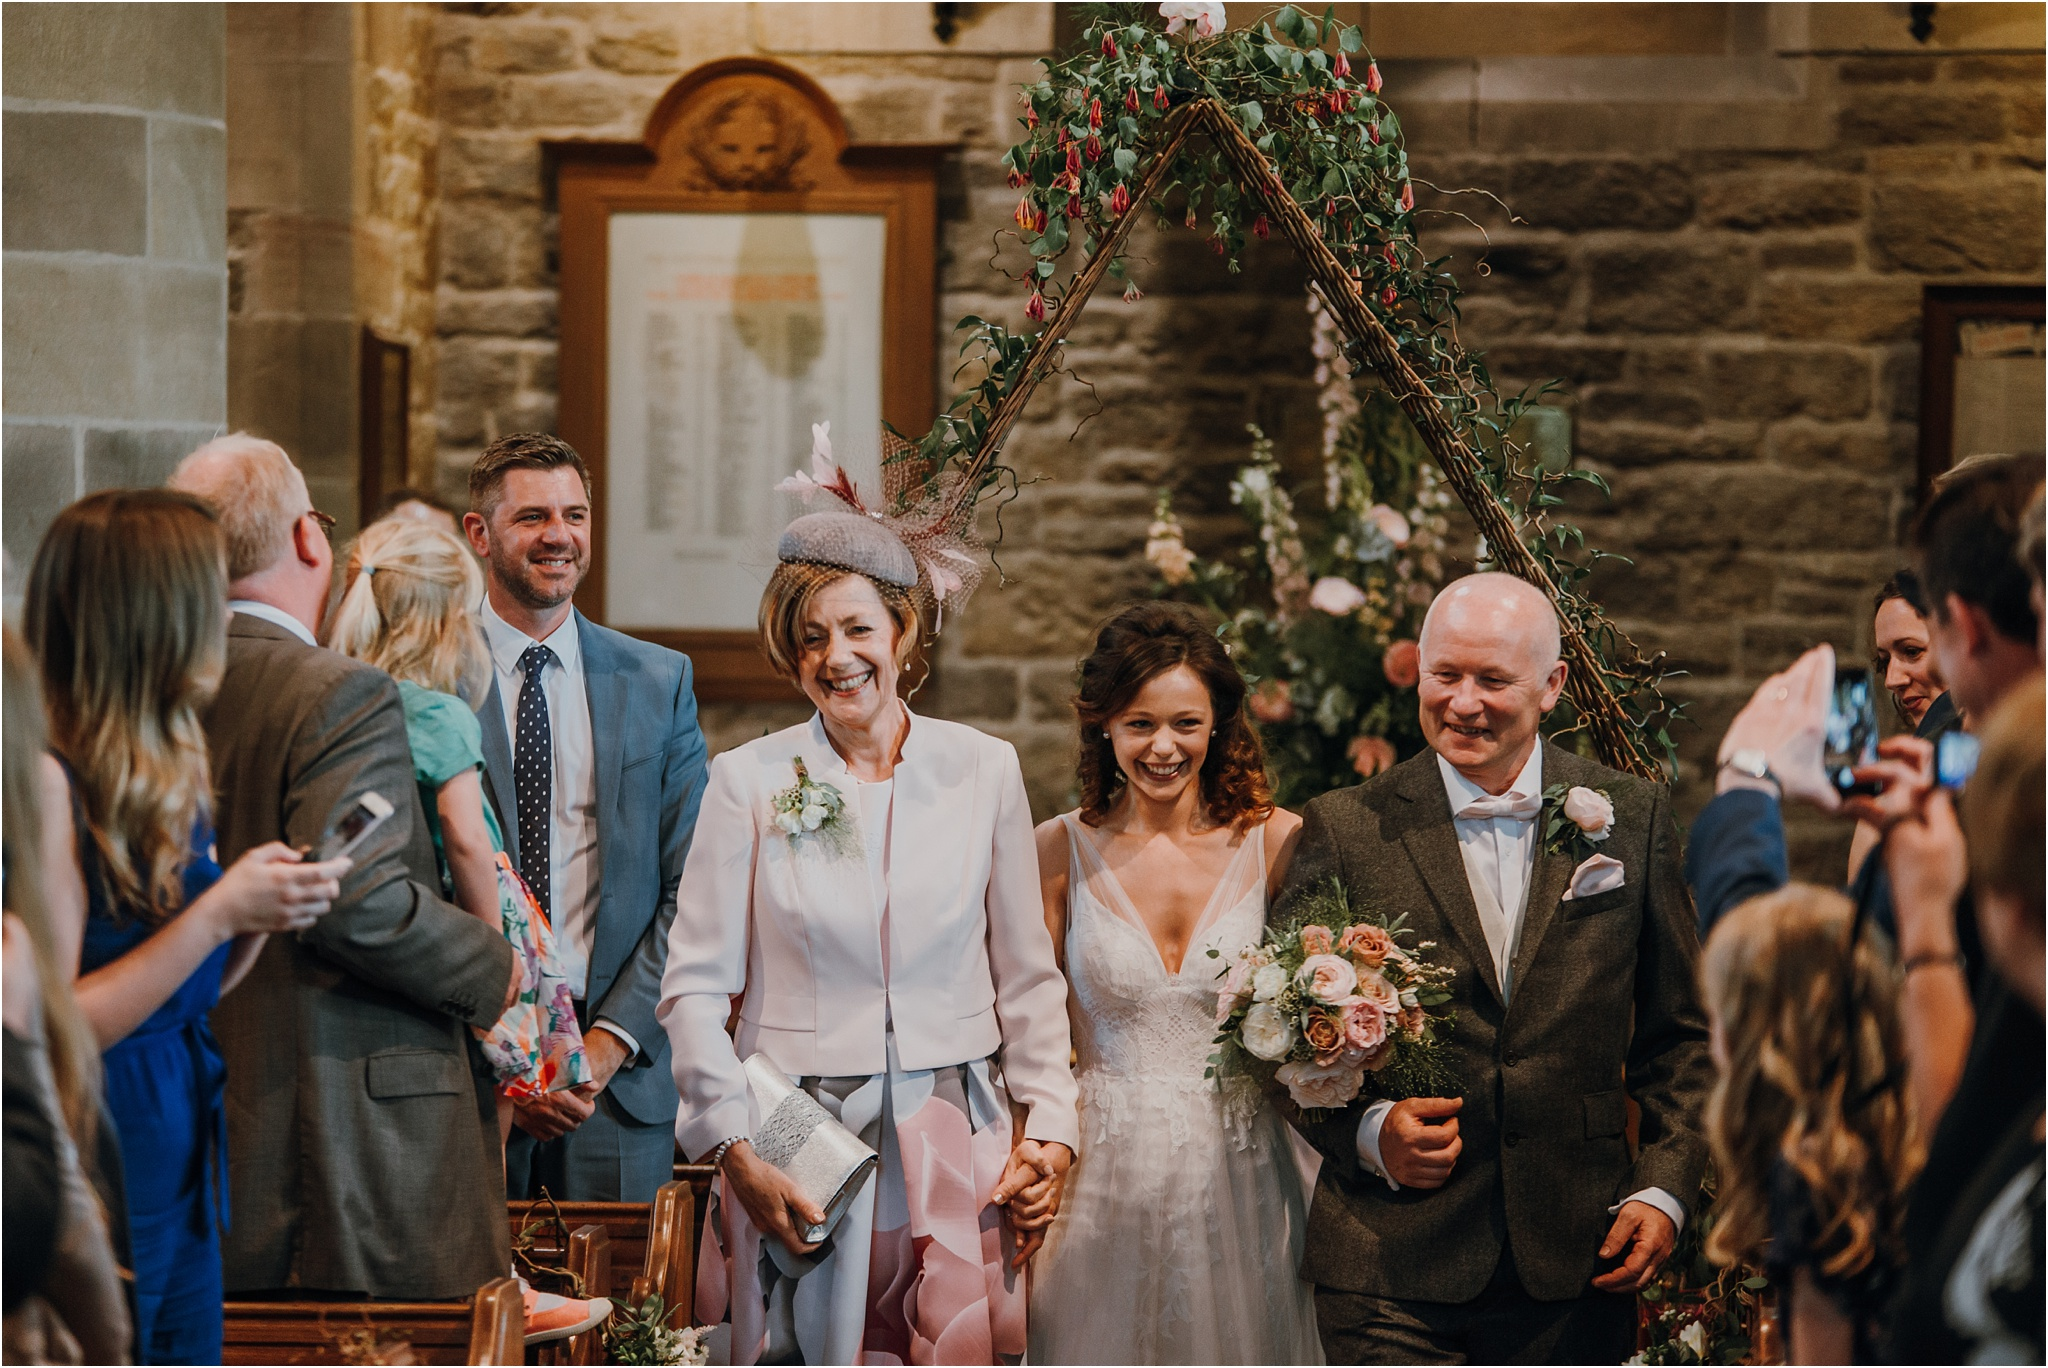 Outdoor-country-wedding-Edinburgh-photographer__0184.jpg